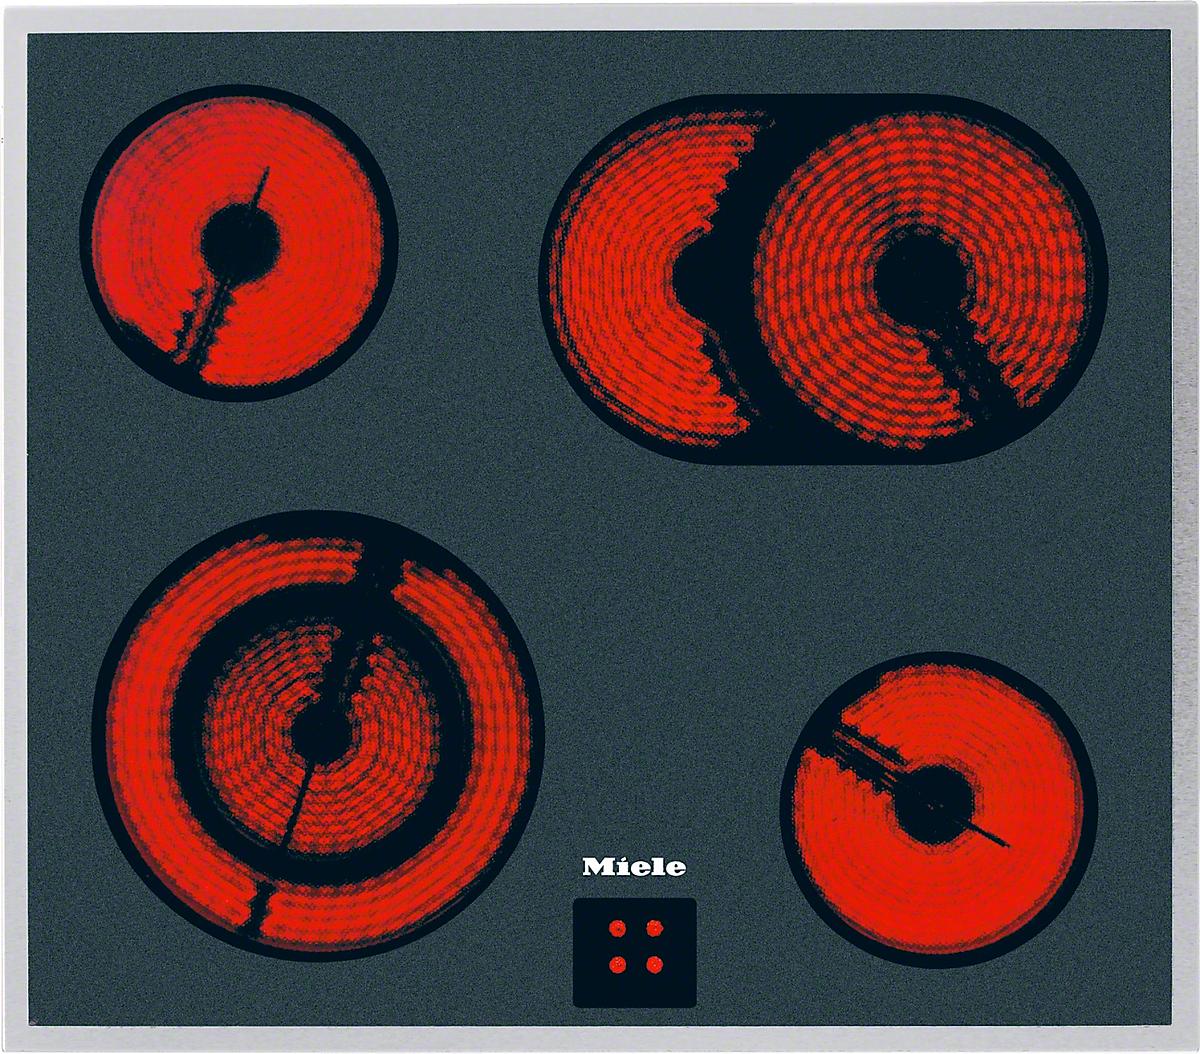 miele kochfeld km 6013 lightprint vs elektro. Black Bedroom Furniture Sets. Home Design Ideas